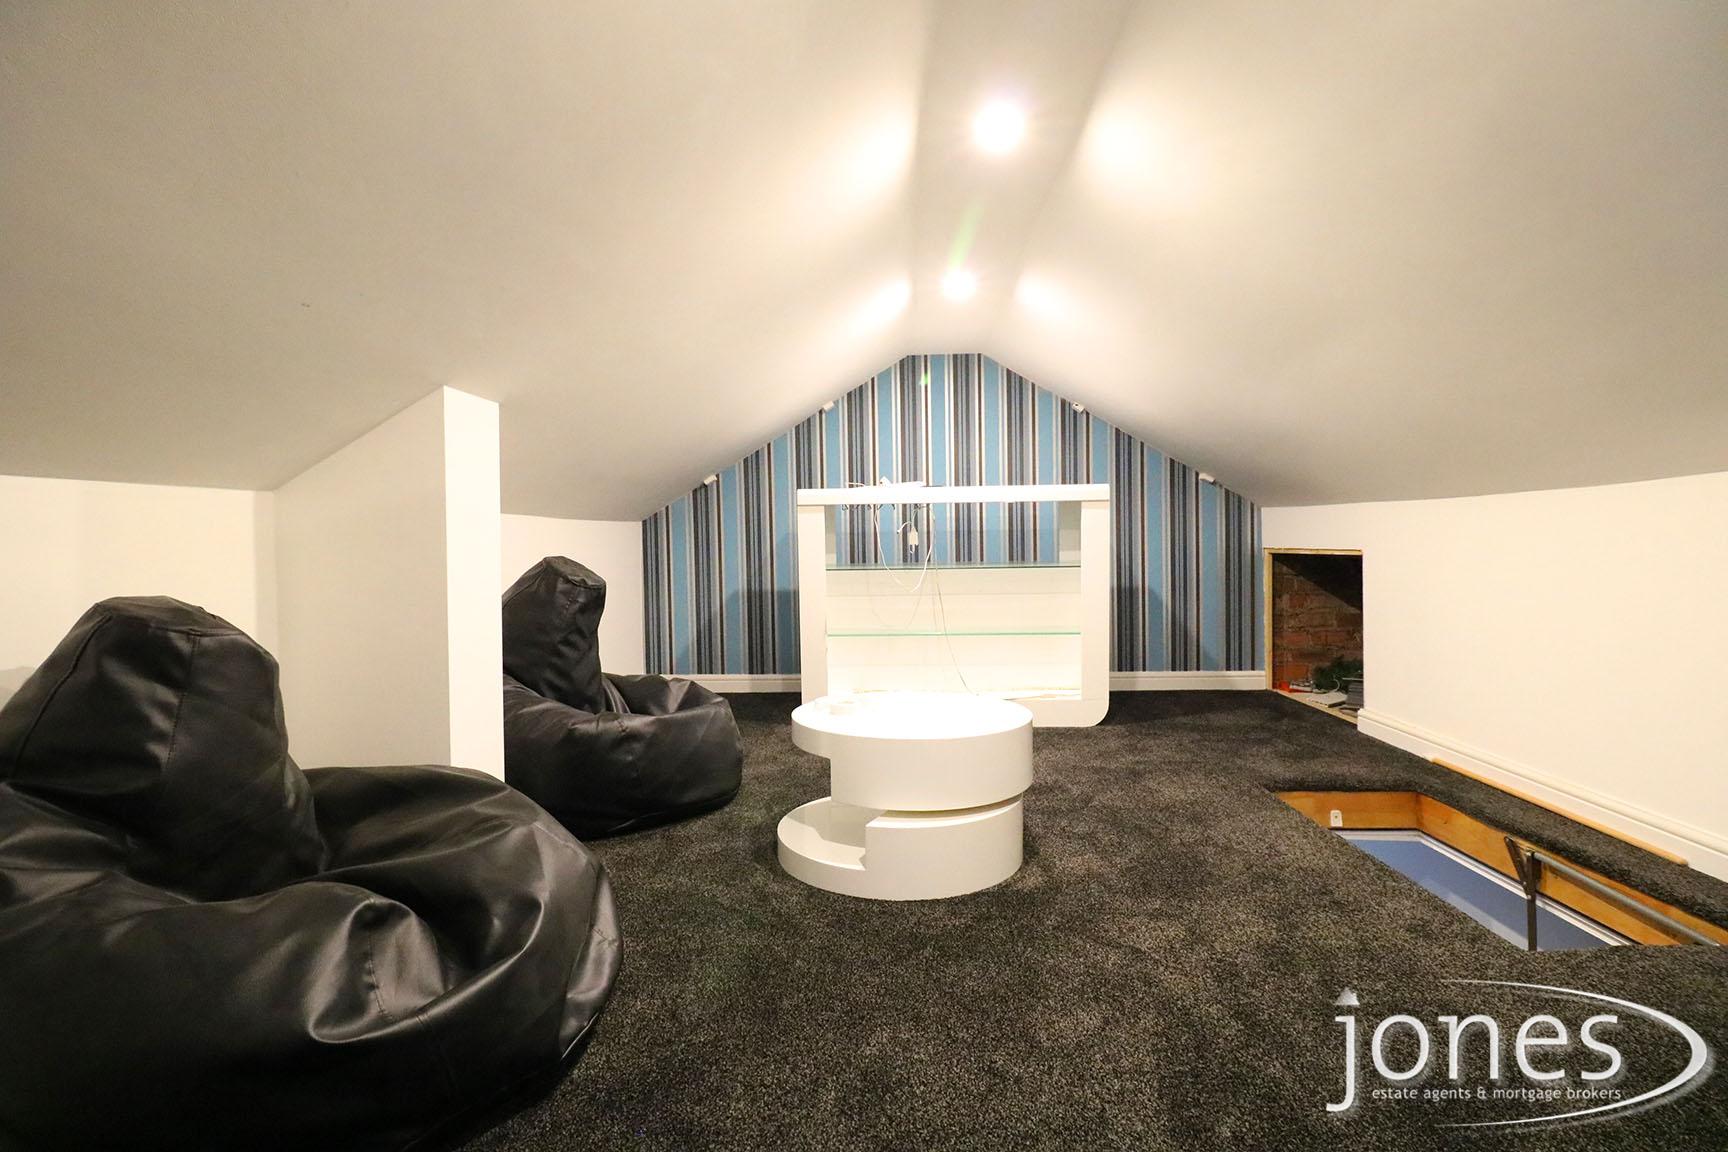 Home for Sale Let - Photo 10 Feetham Avenue, Darlington, DL1 2DY